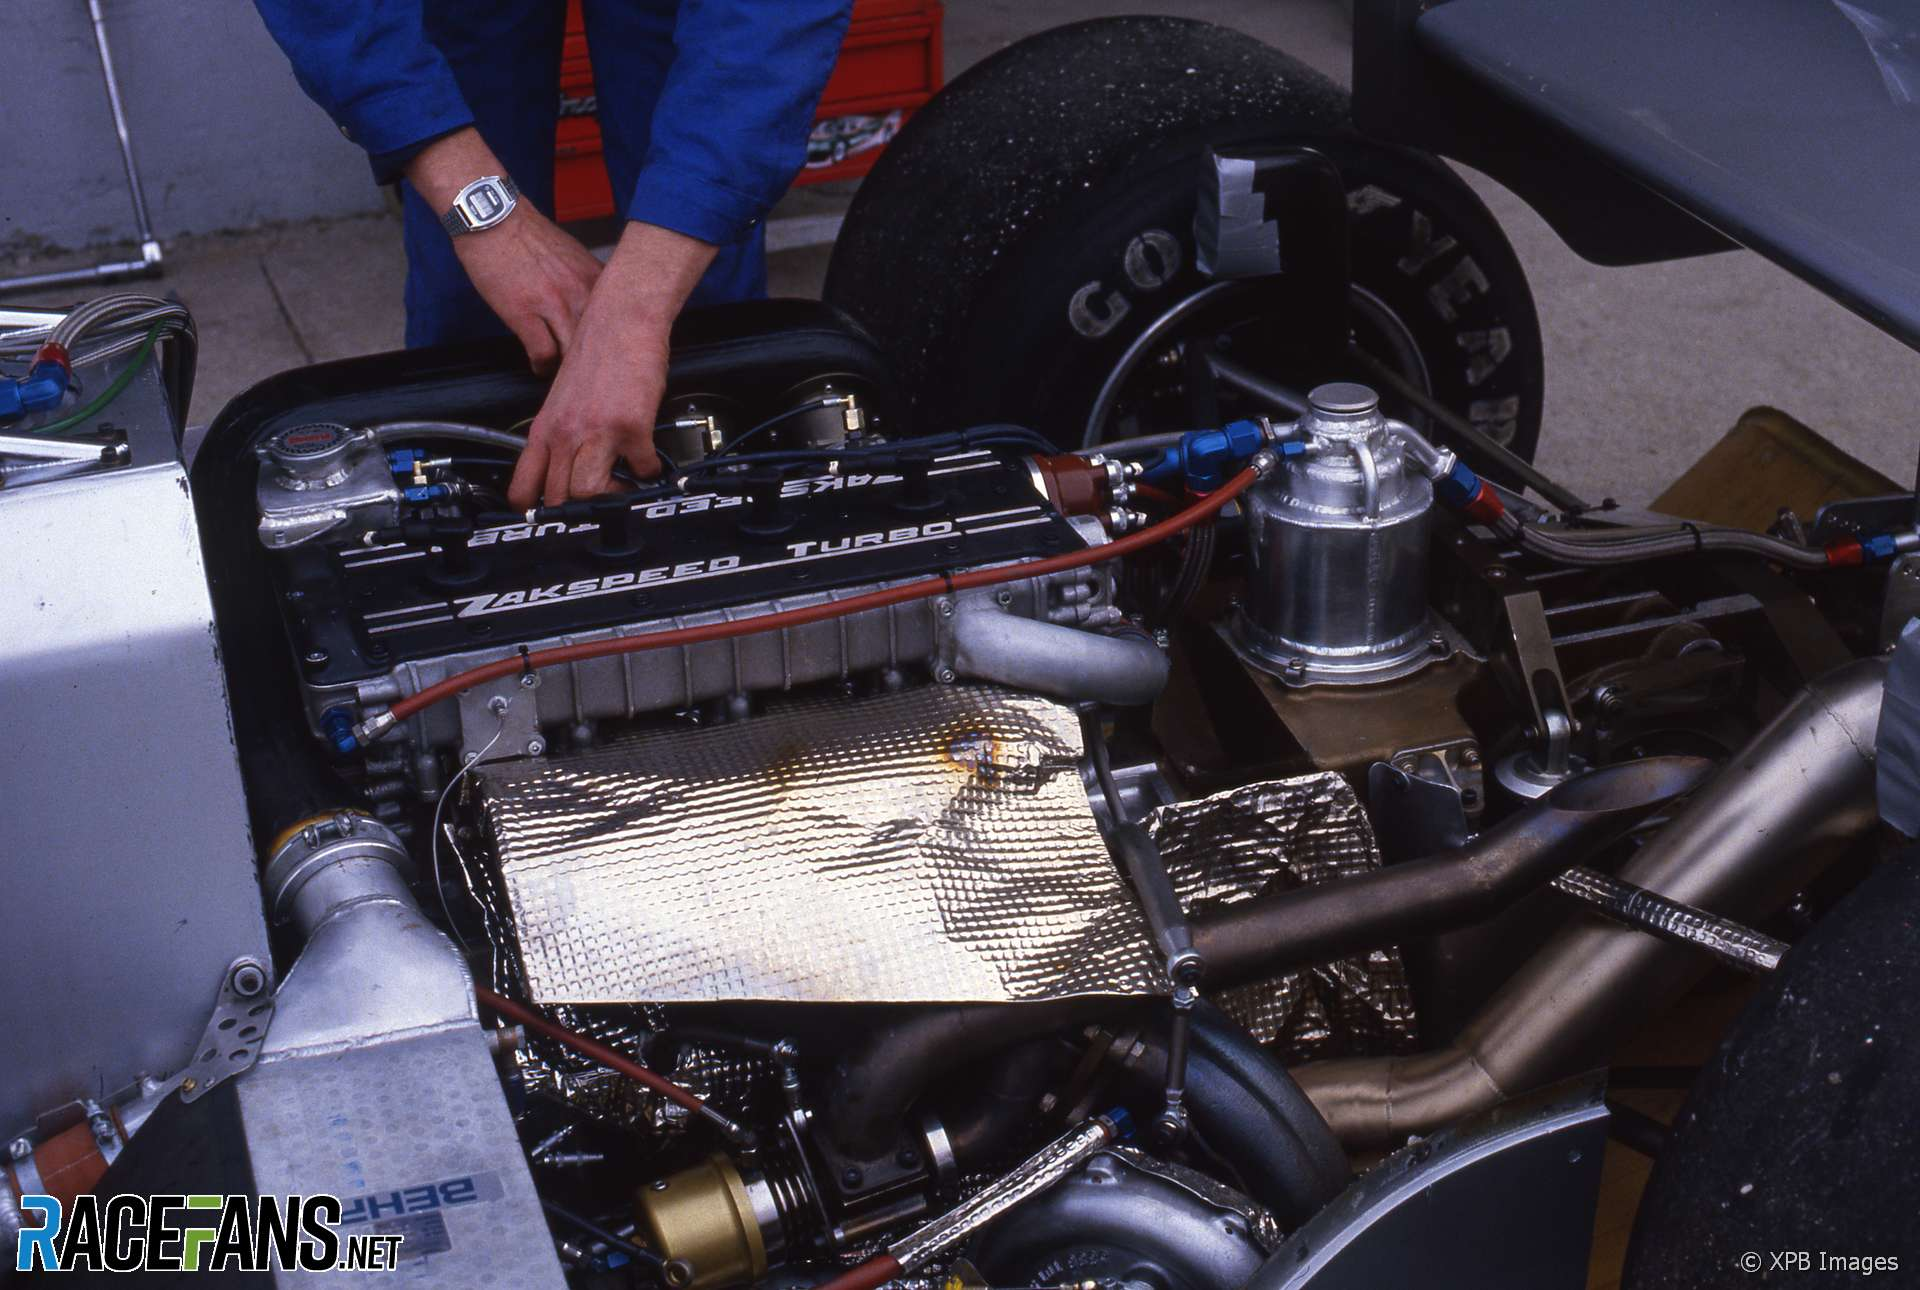 Zakspeed 841 turbo engine, Estoril, 1985